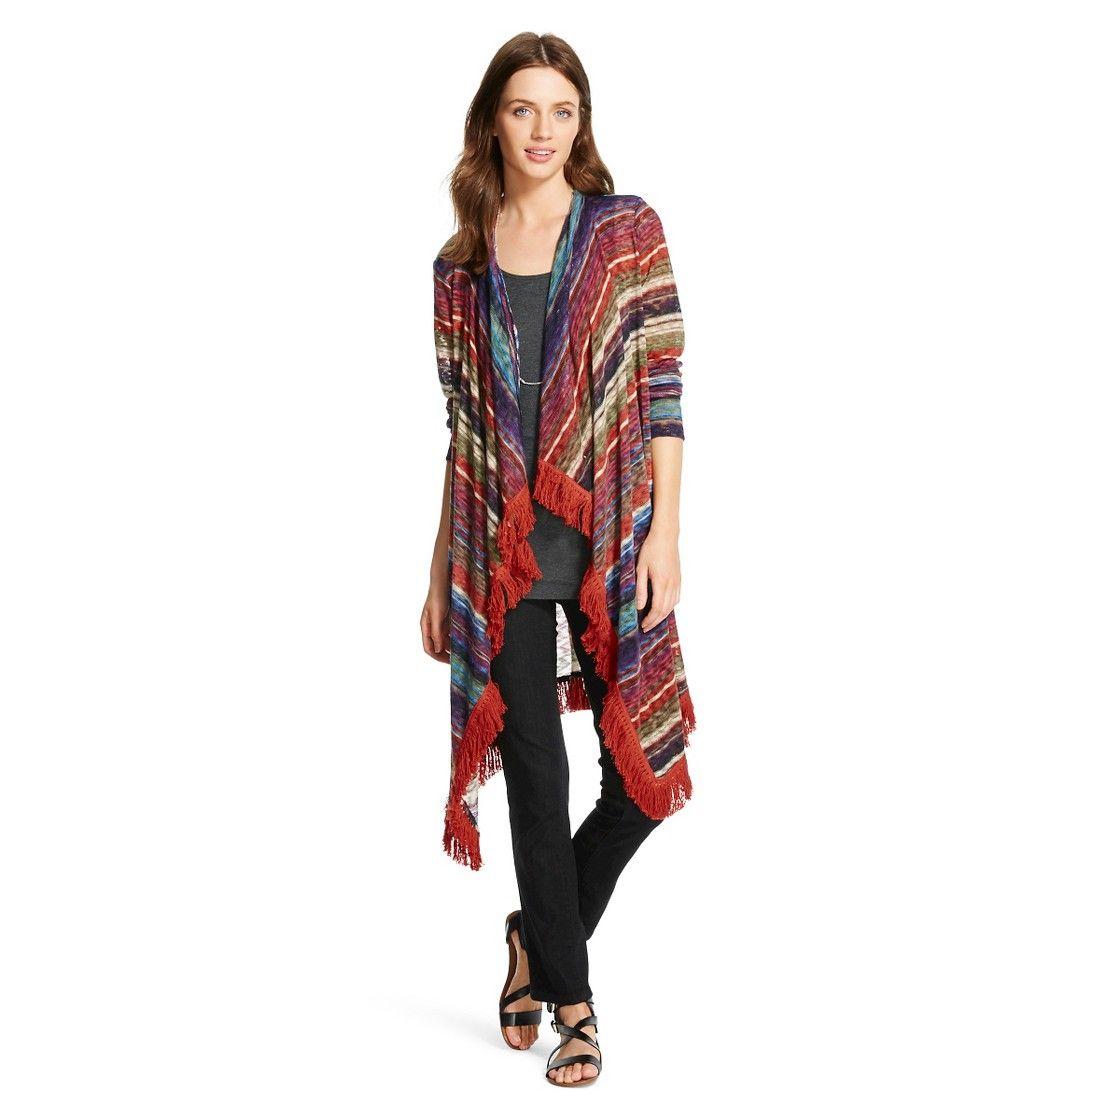 Women's Striped Sweater Cardigan - John Paul Richard | WISH LIST ...